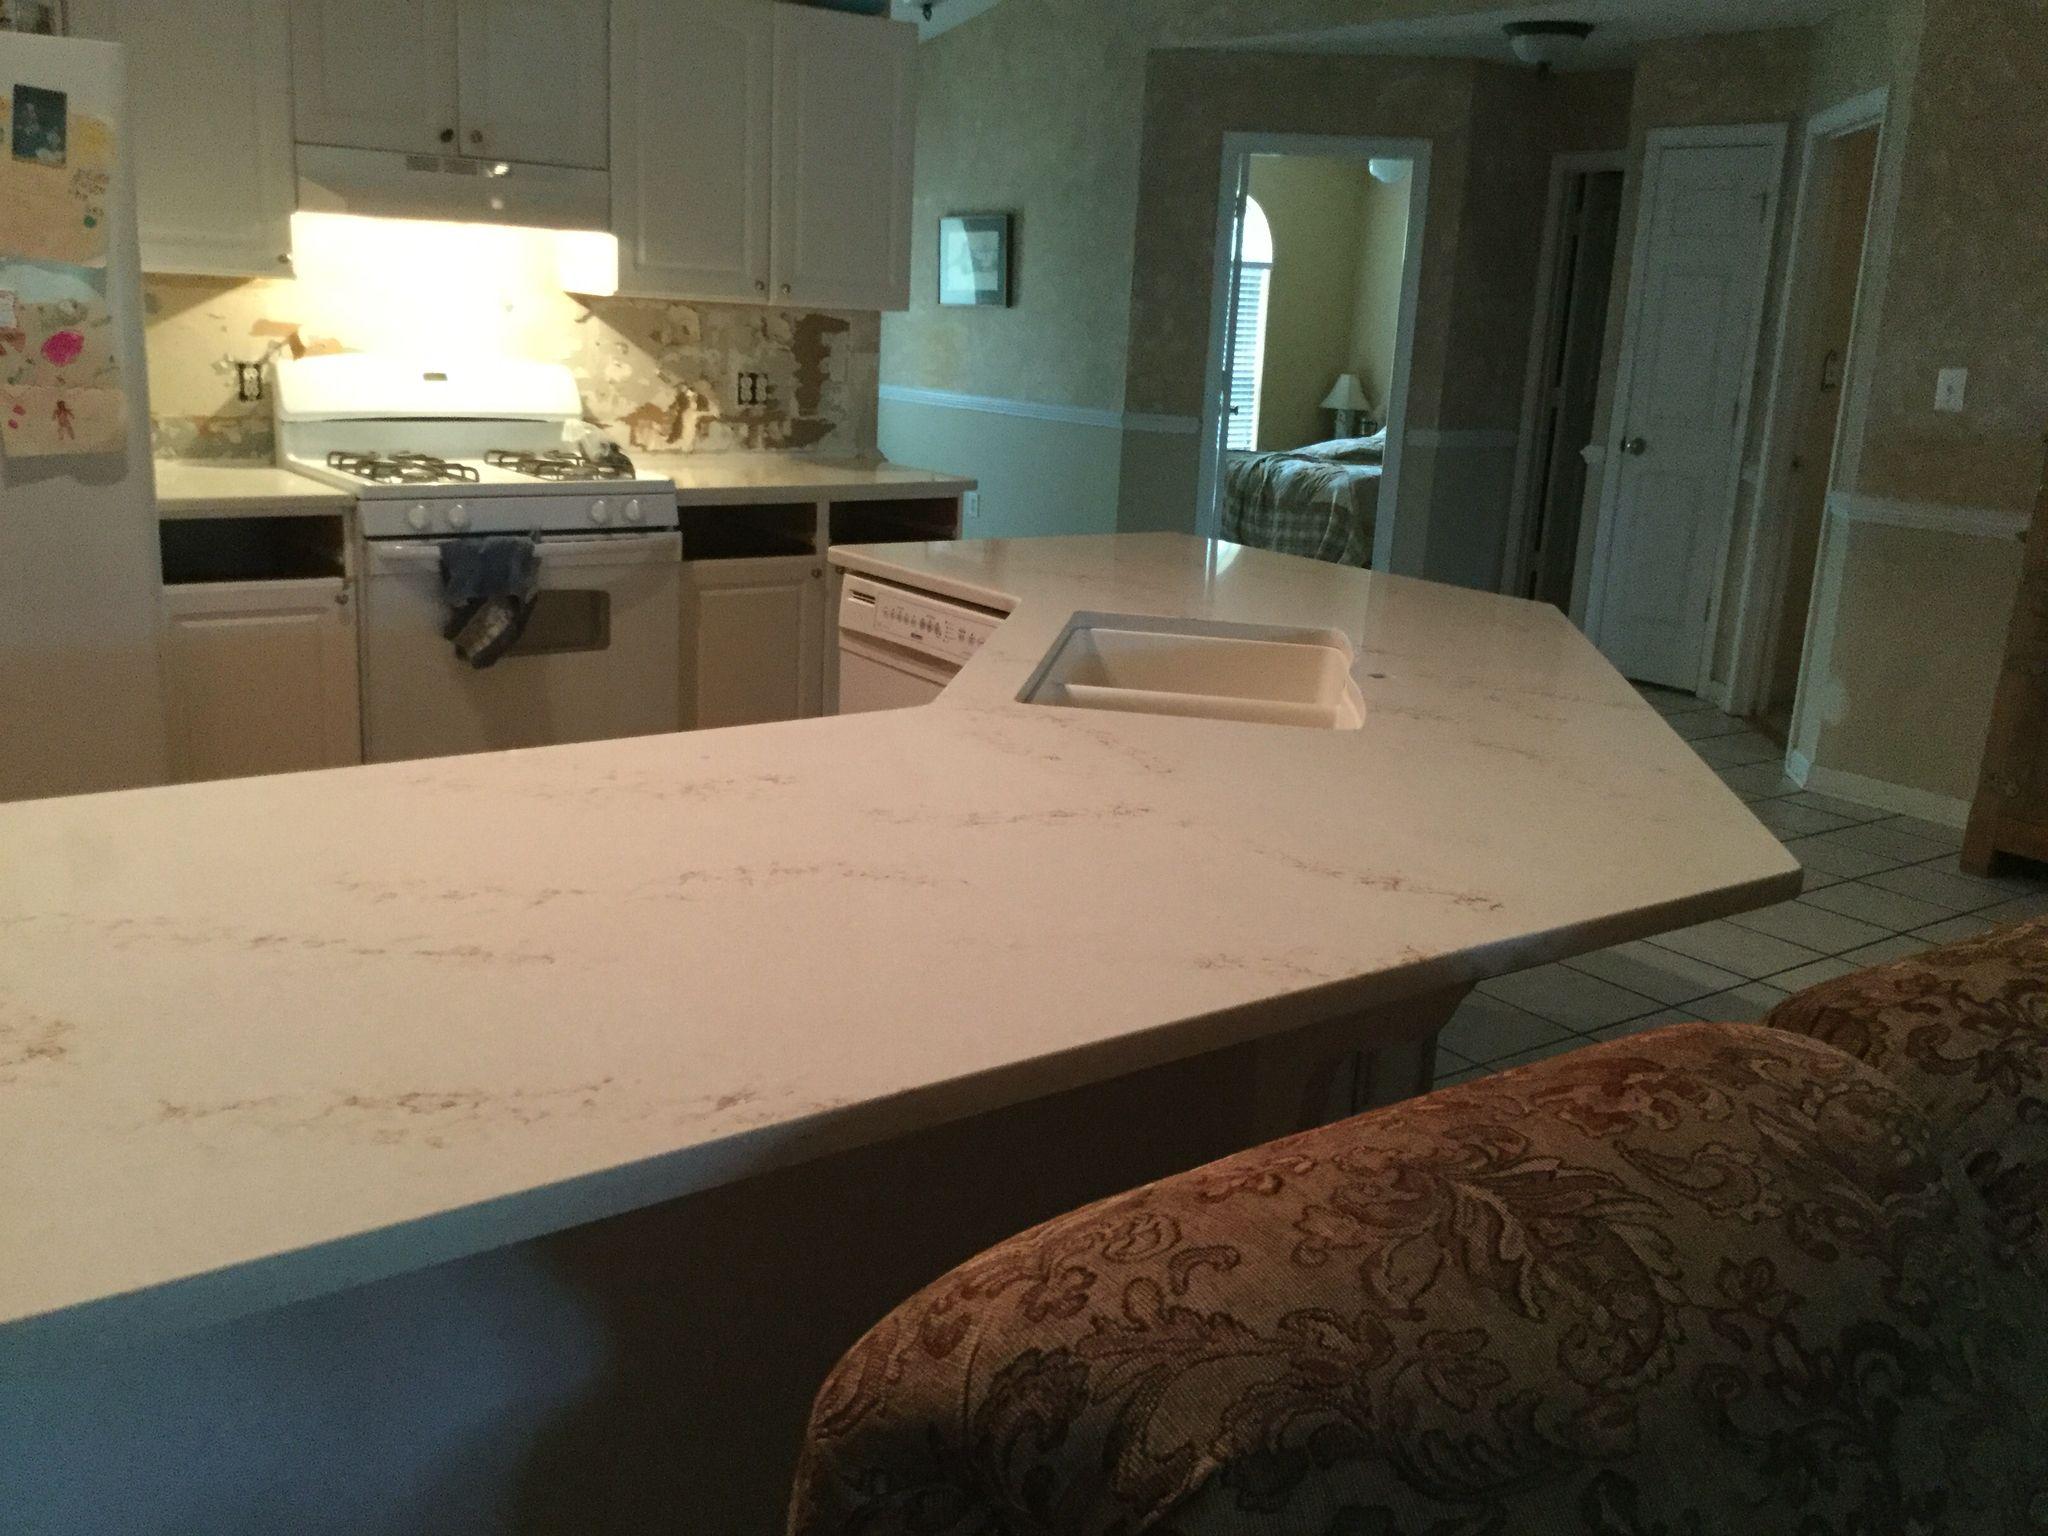 New Quartz HanStone Countertop In Serenity Installed By Premier Granite Of  Spartanburg, SC